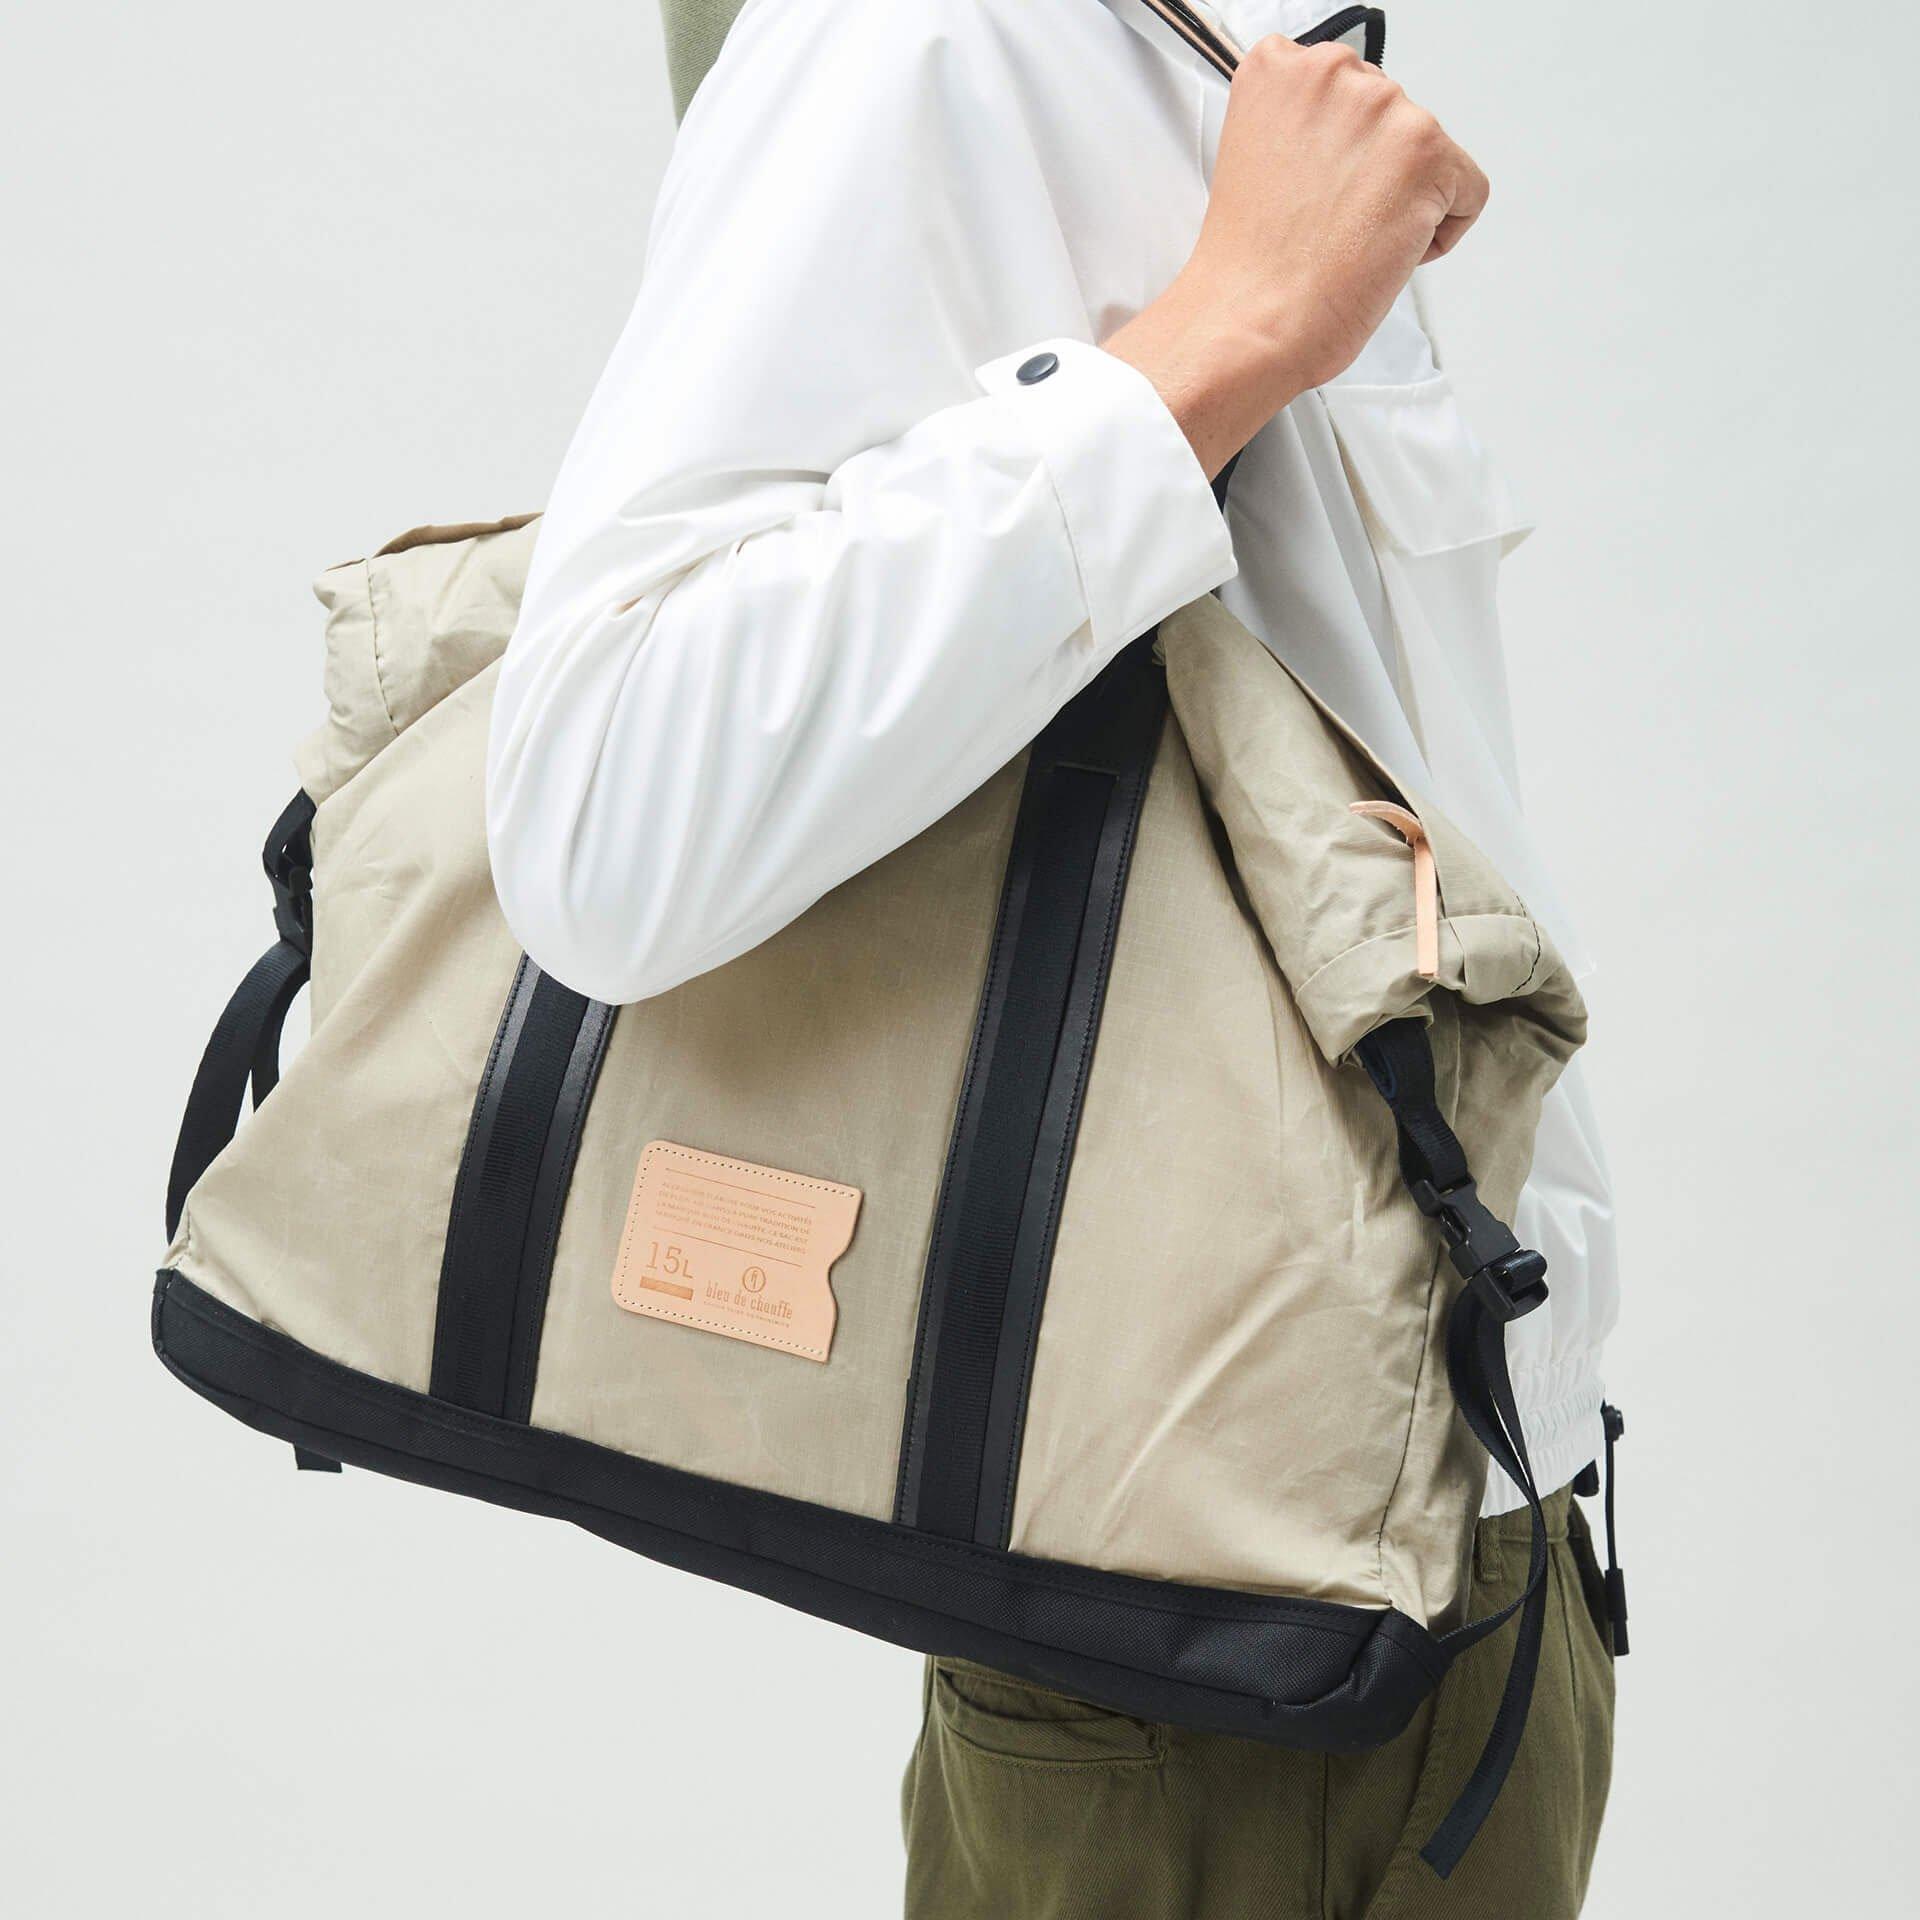 15L Barda Tote bag - Beige (image n°6)